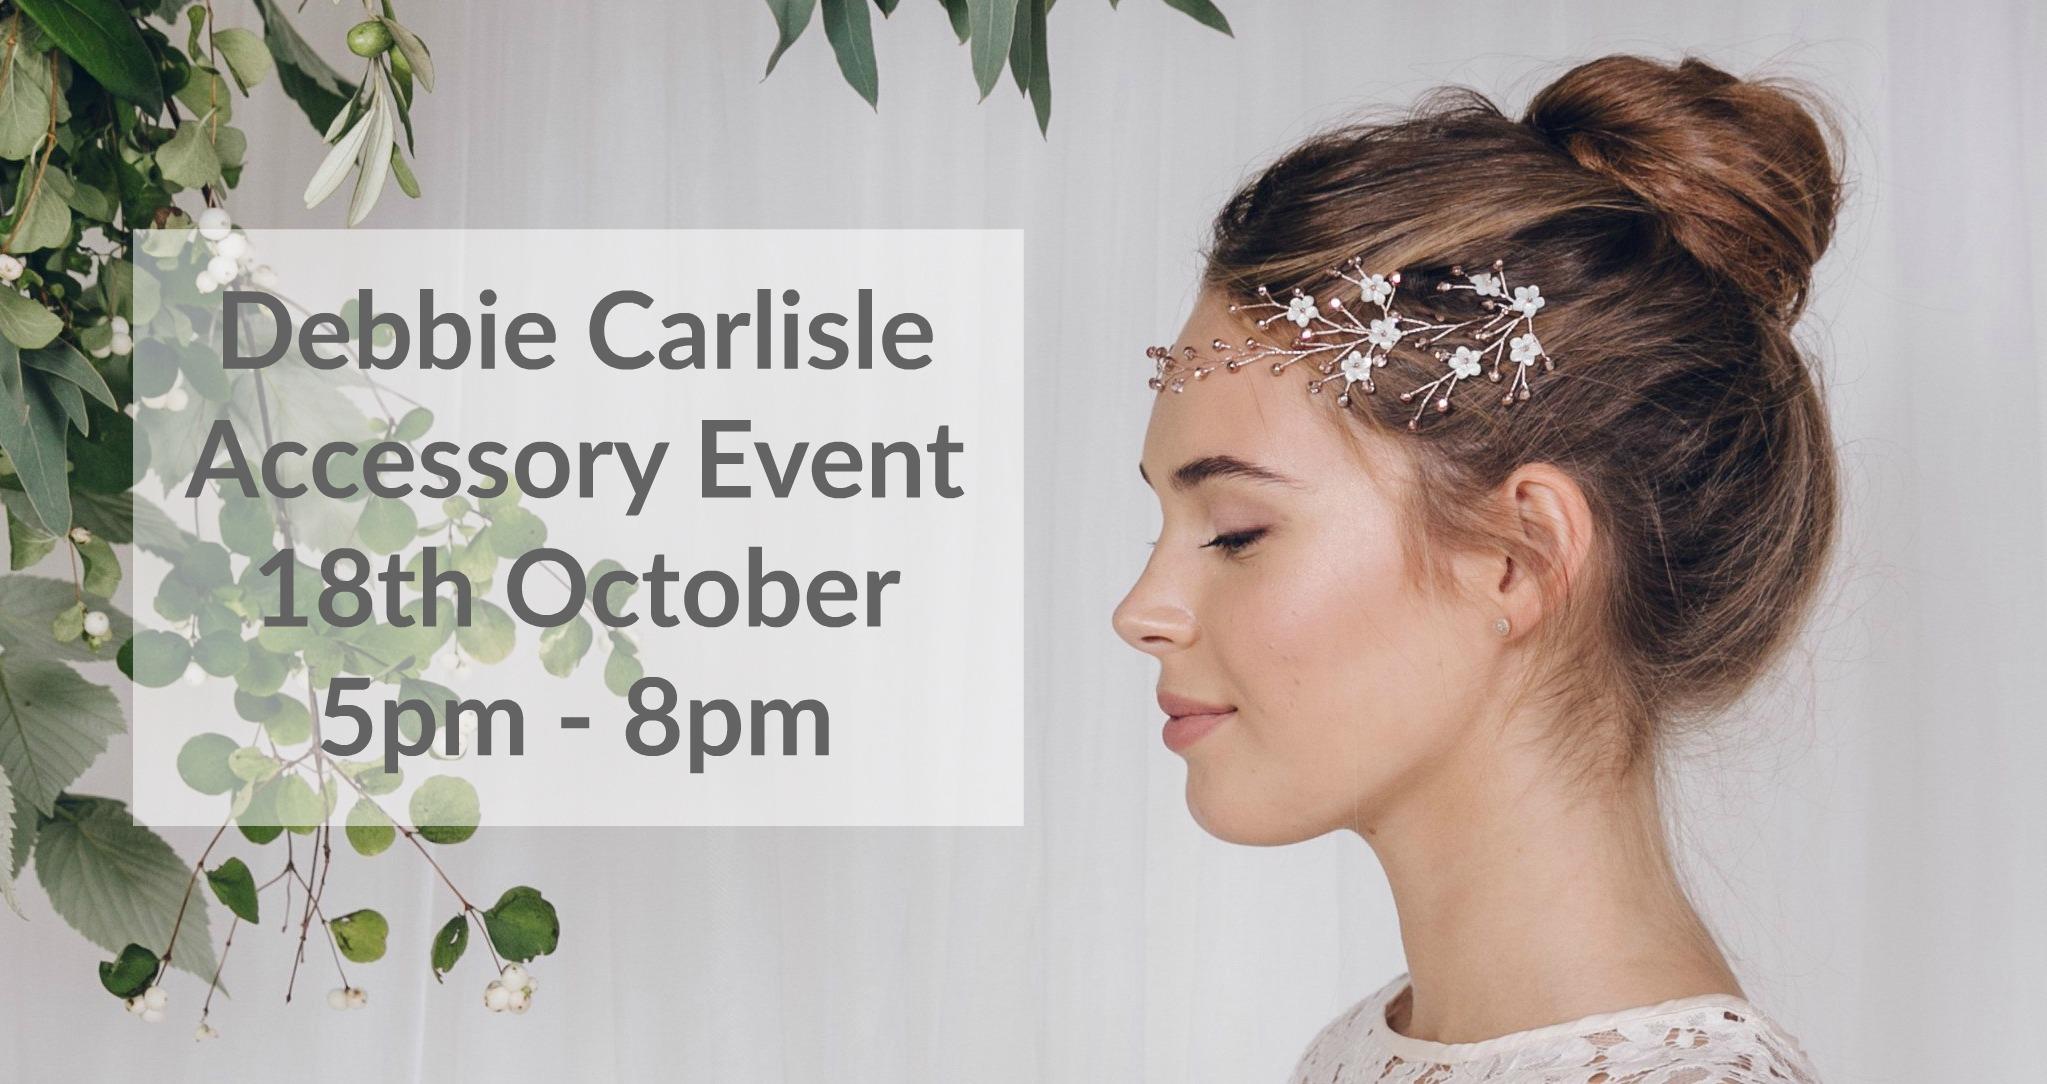 Debbie Carlisle Accessory event